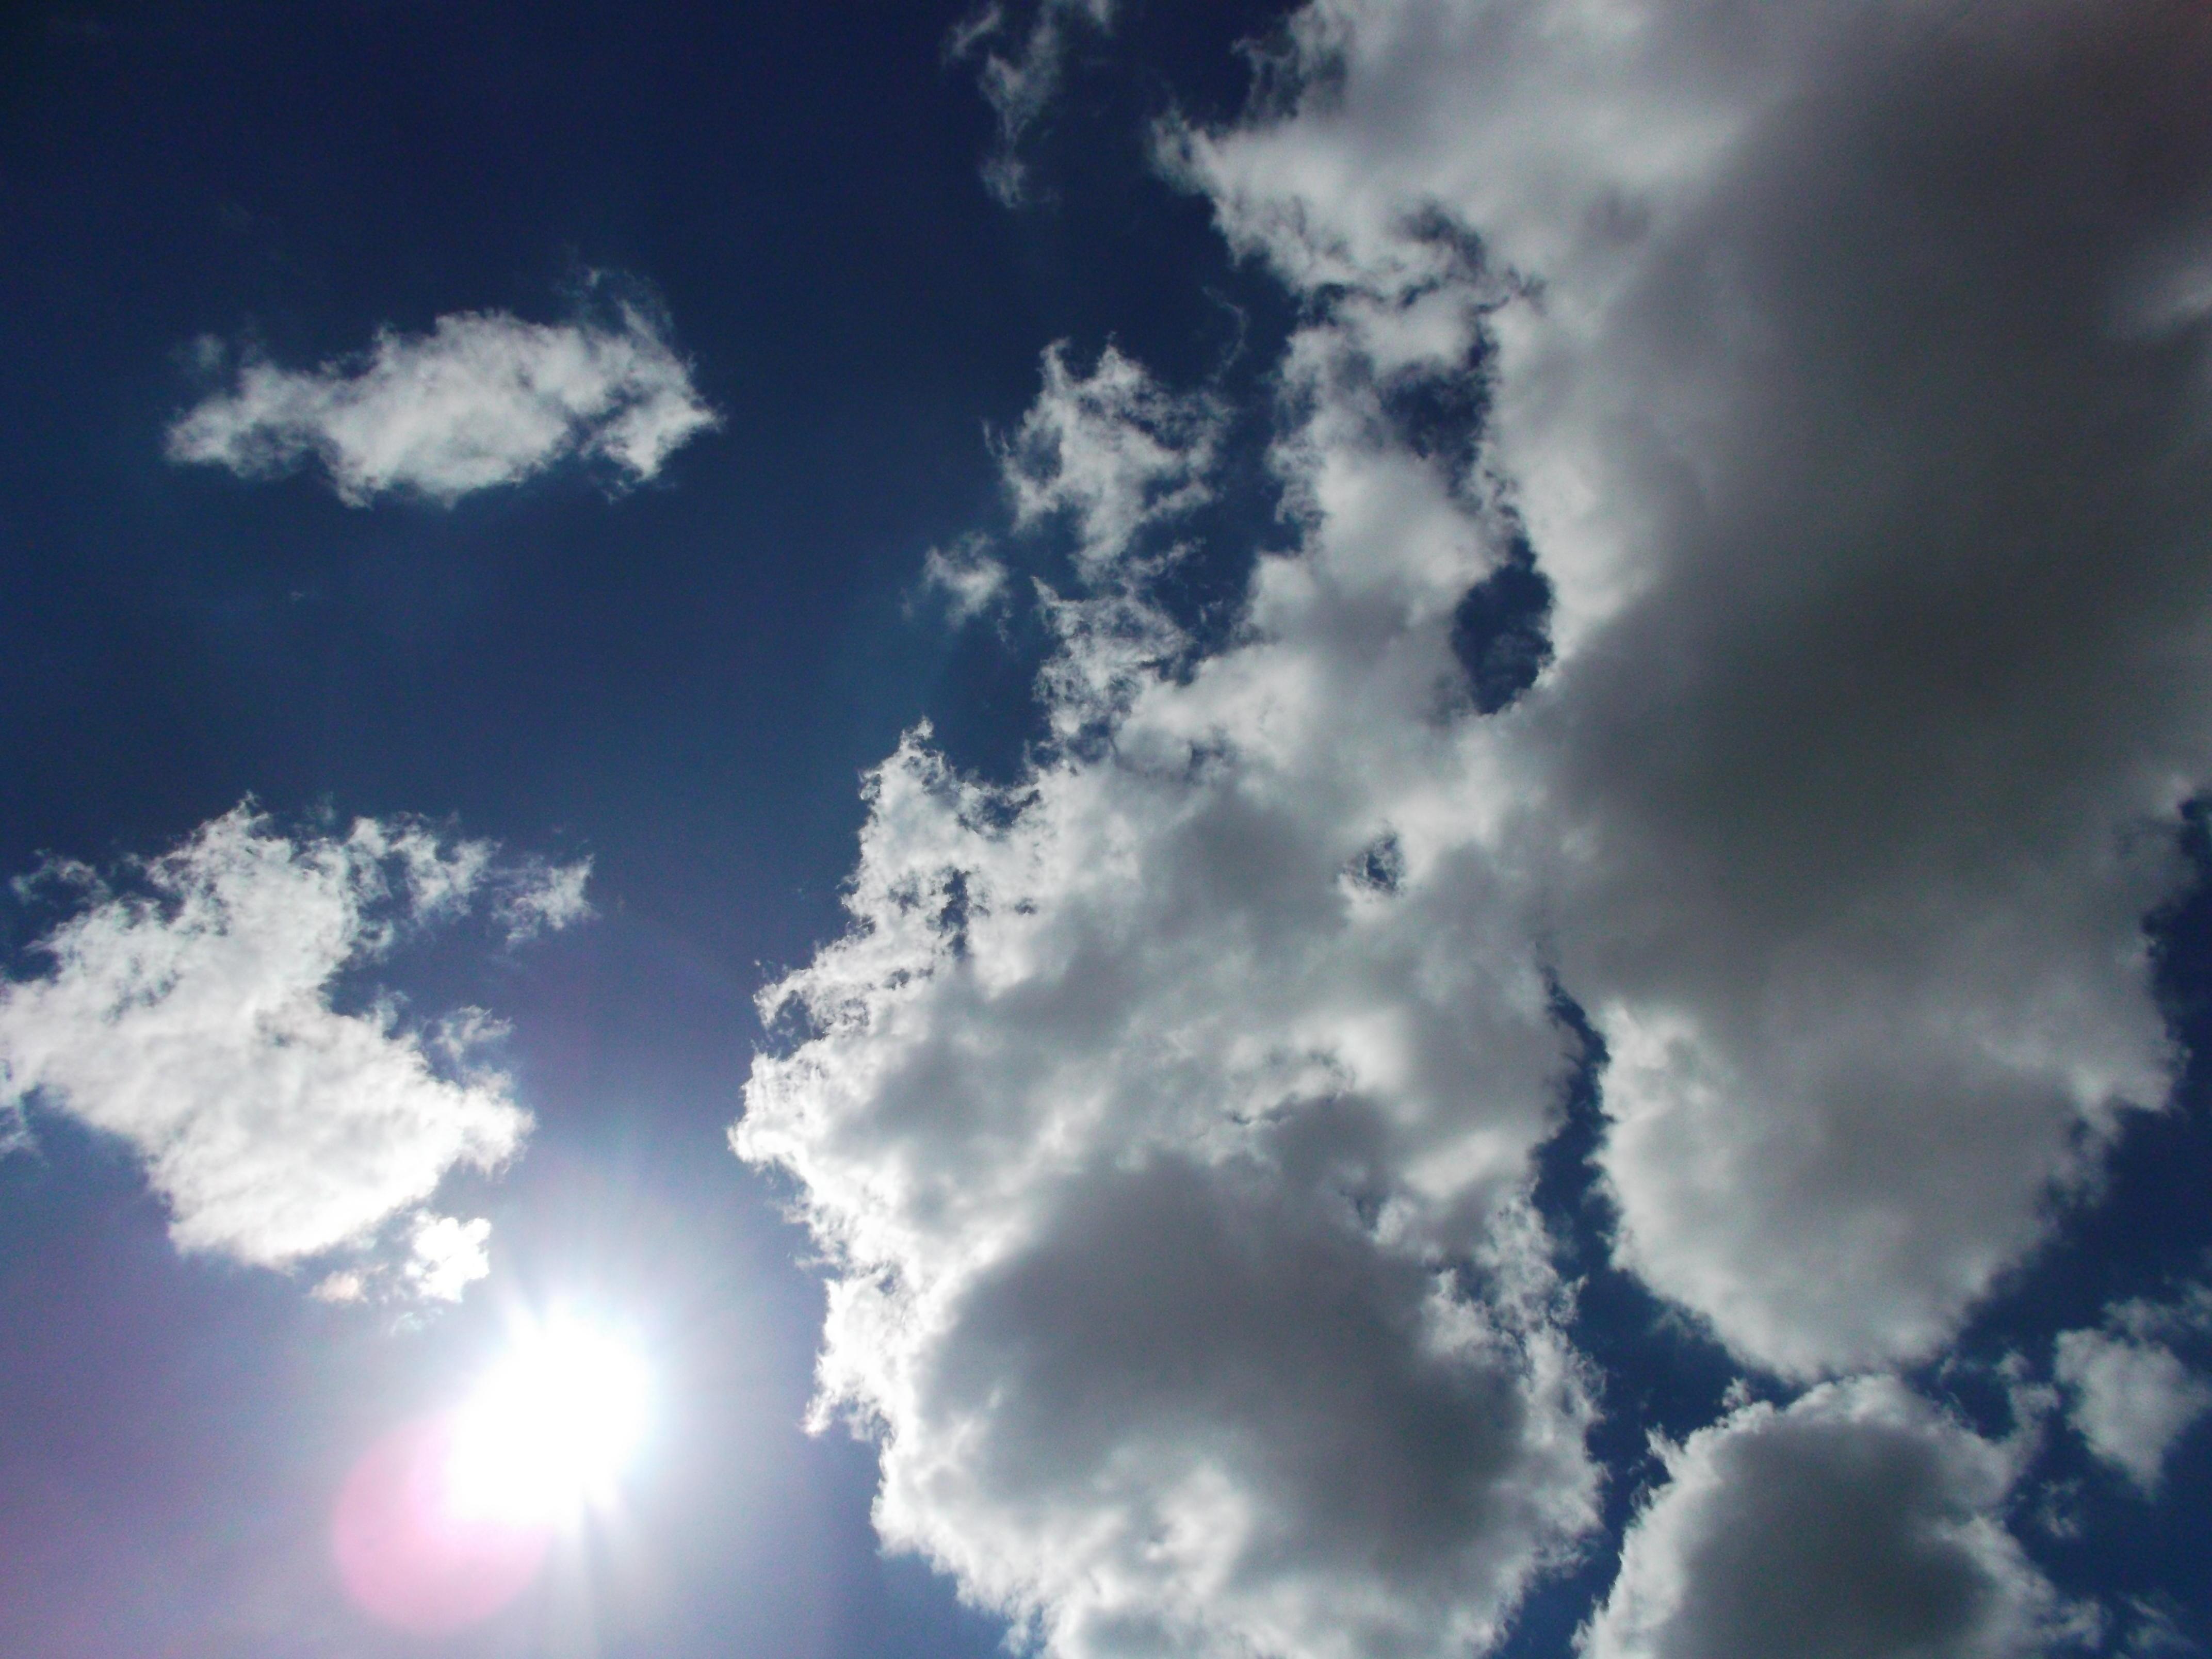 2013-06-01 Longitude -0.371 Latitude 49.182 Altitude 29 Heure 16h12